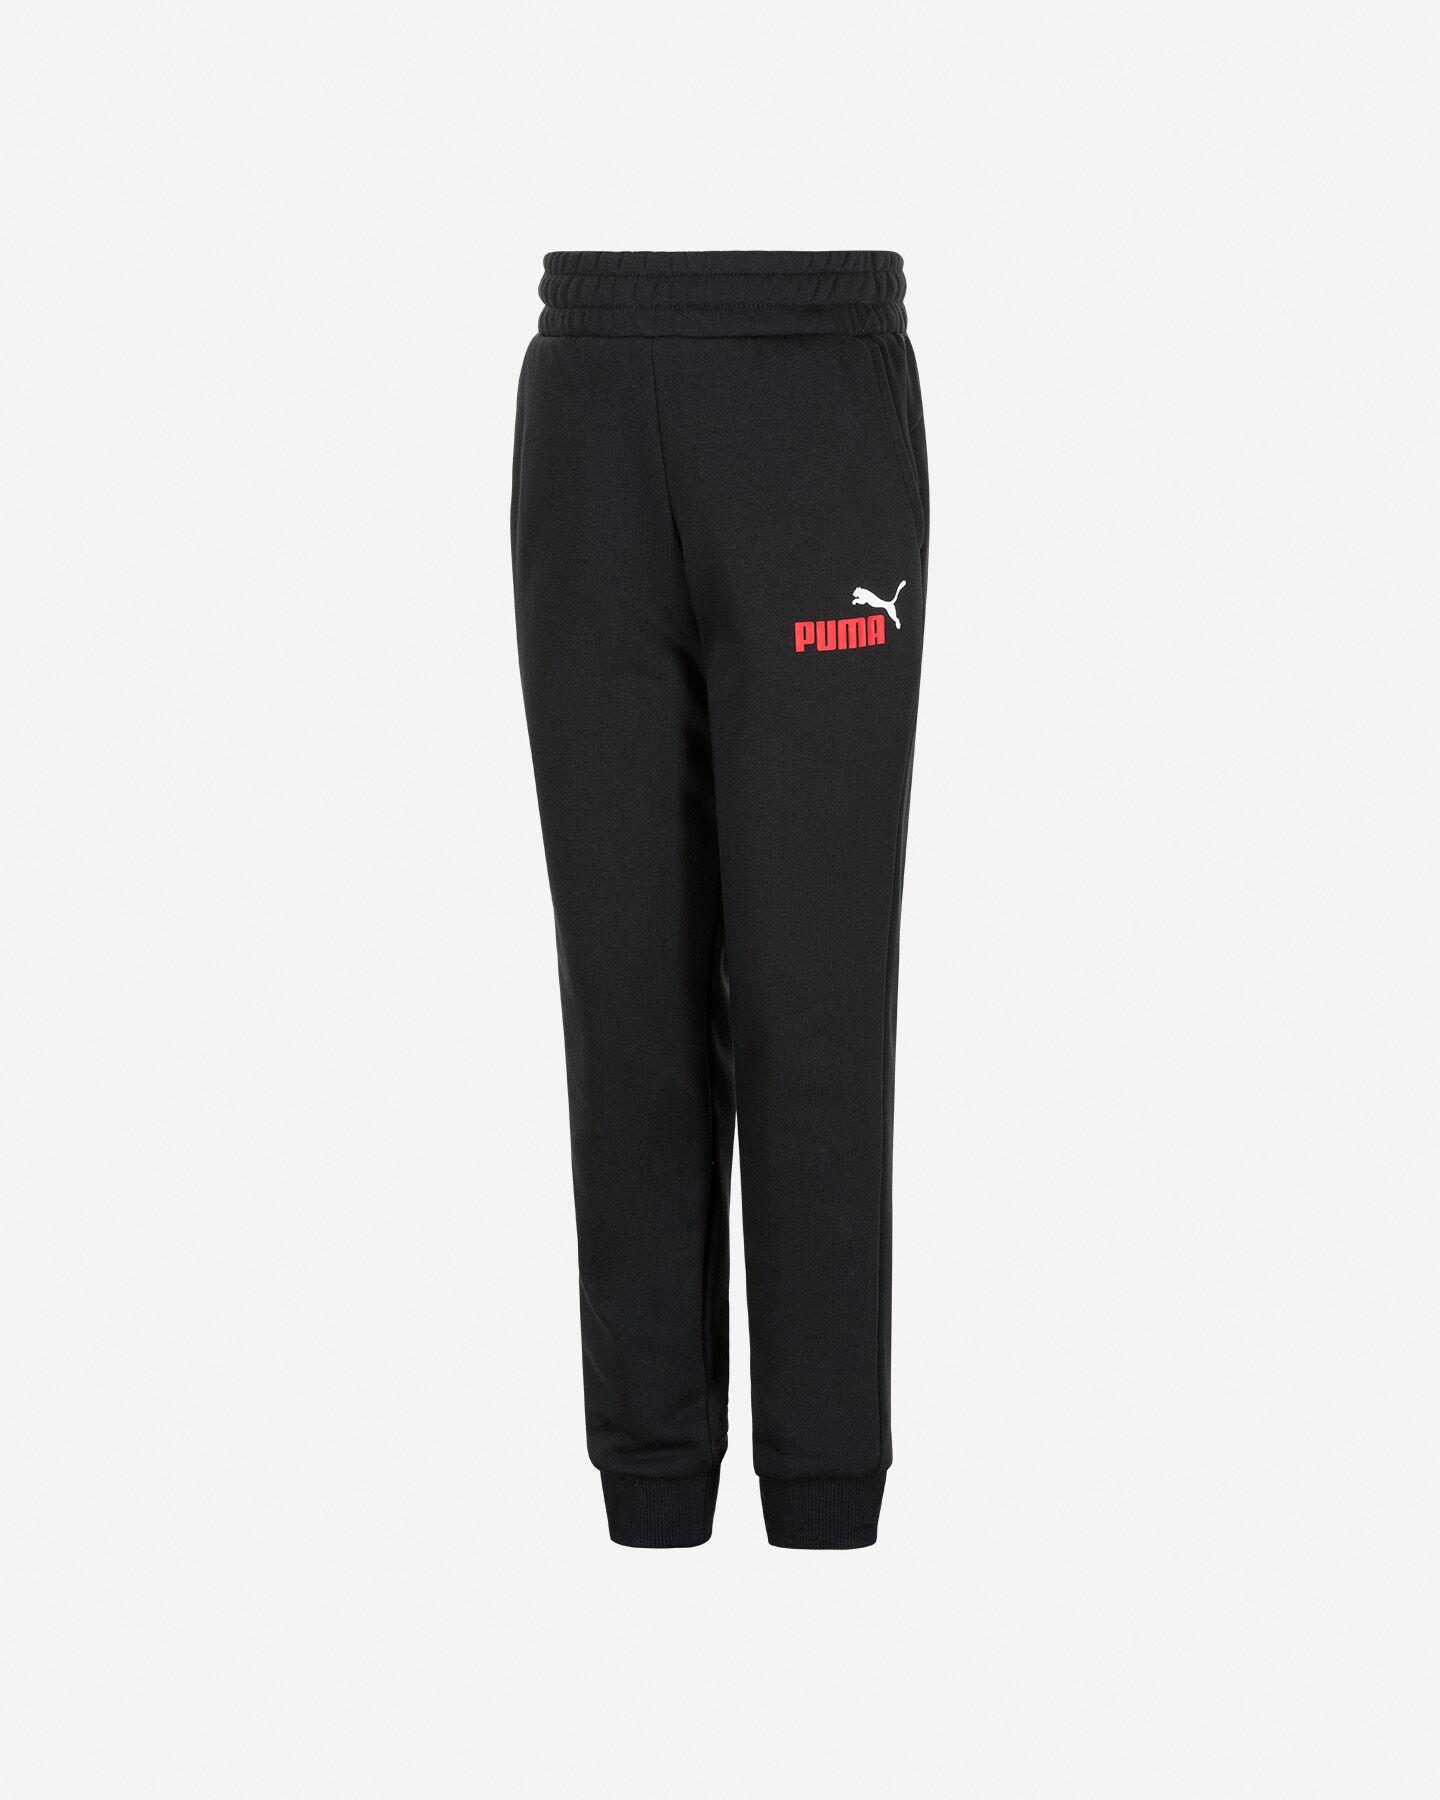 Pantalone PUMA FNG LOGO JR S5236089 scatto 0